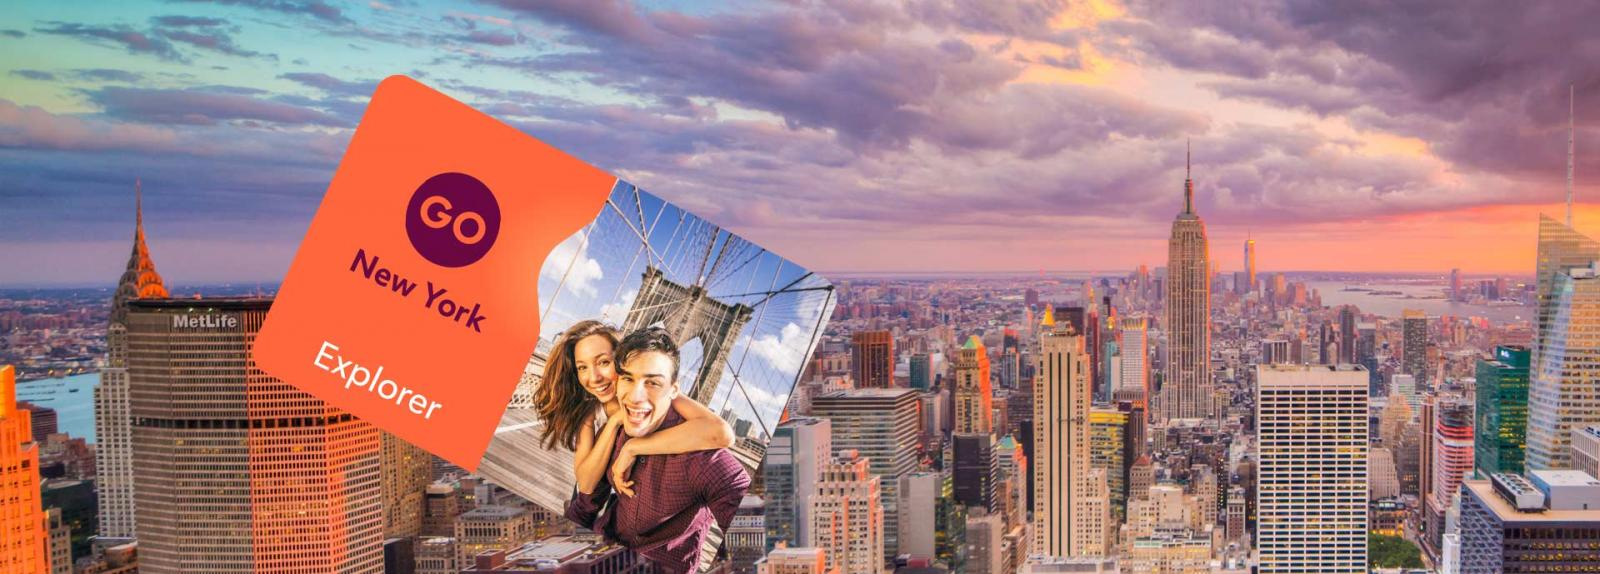 new york explorer pass 2021 lohnt er sich ab 57 eur  video